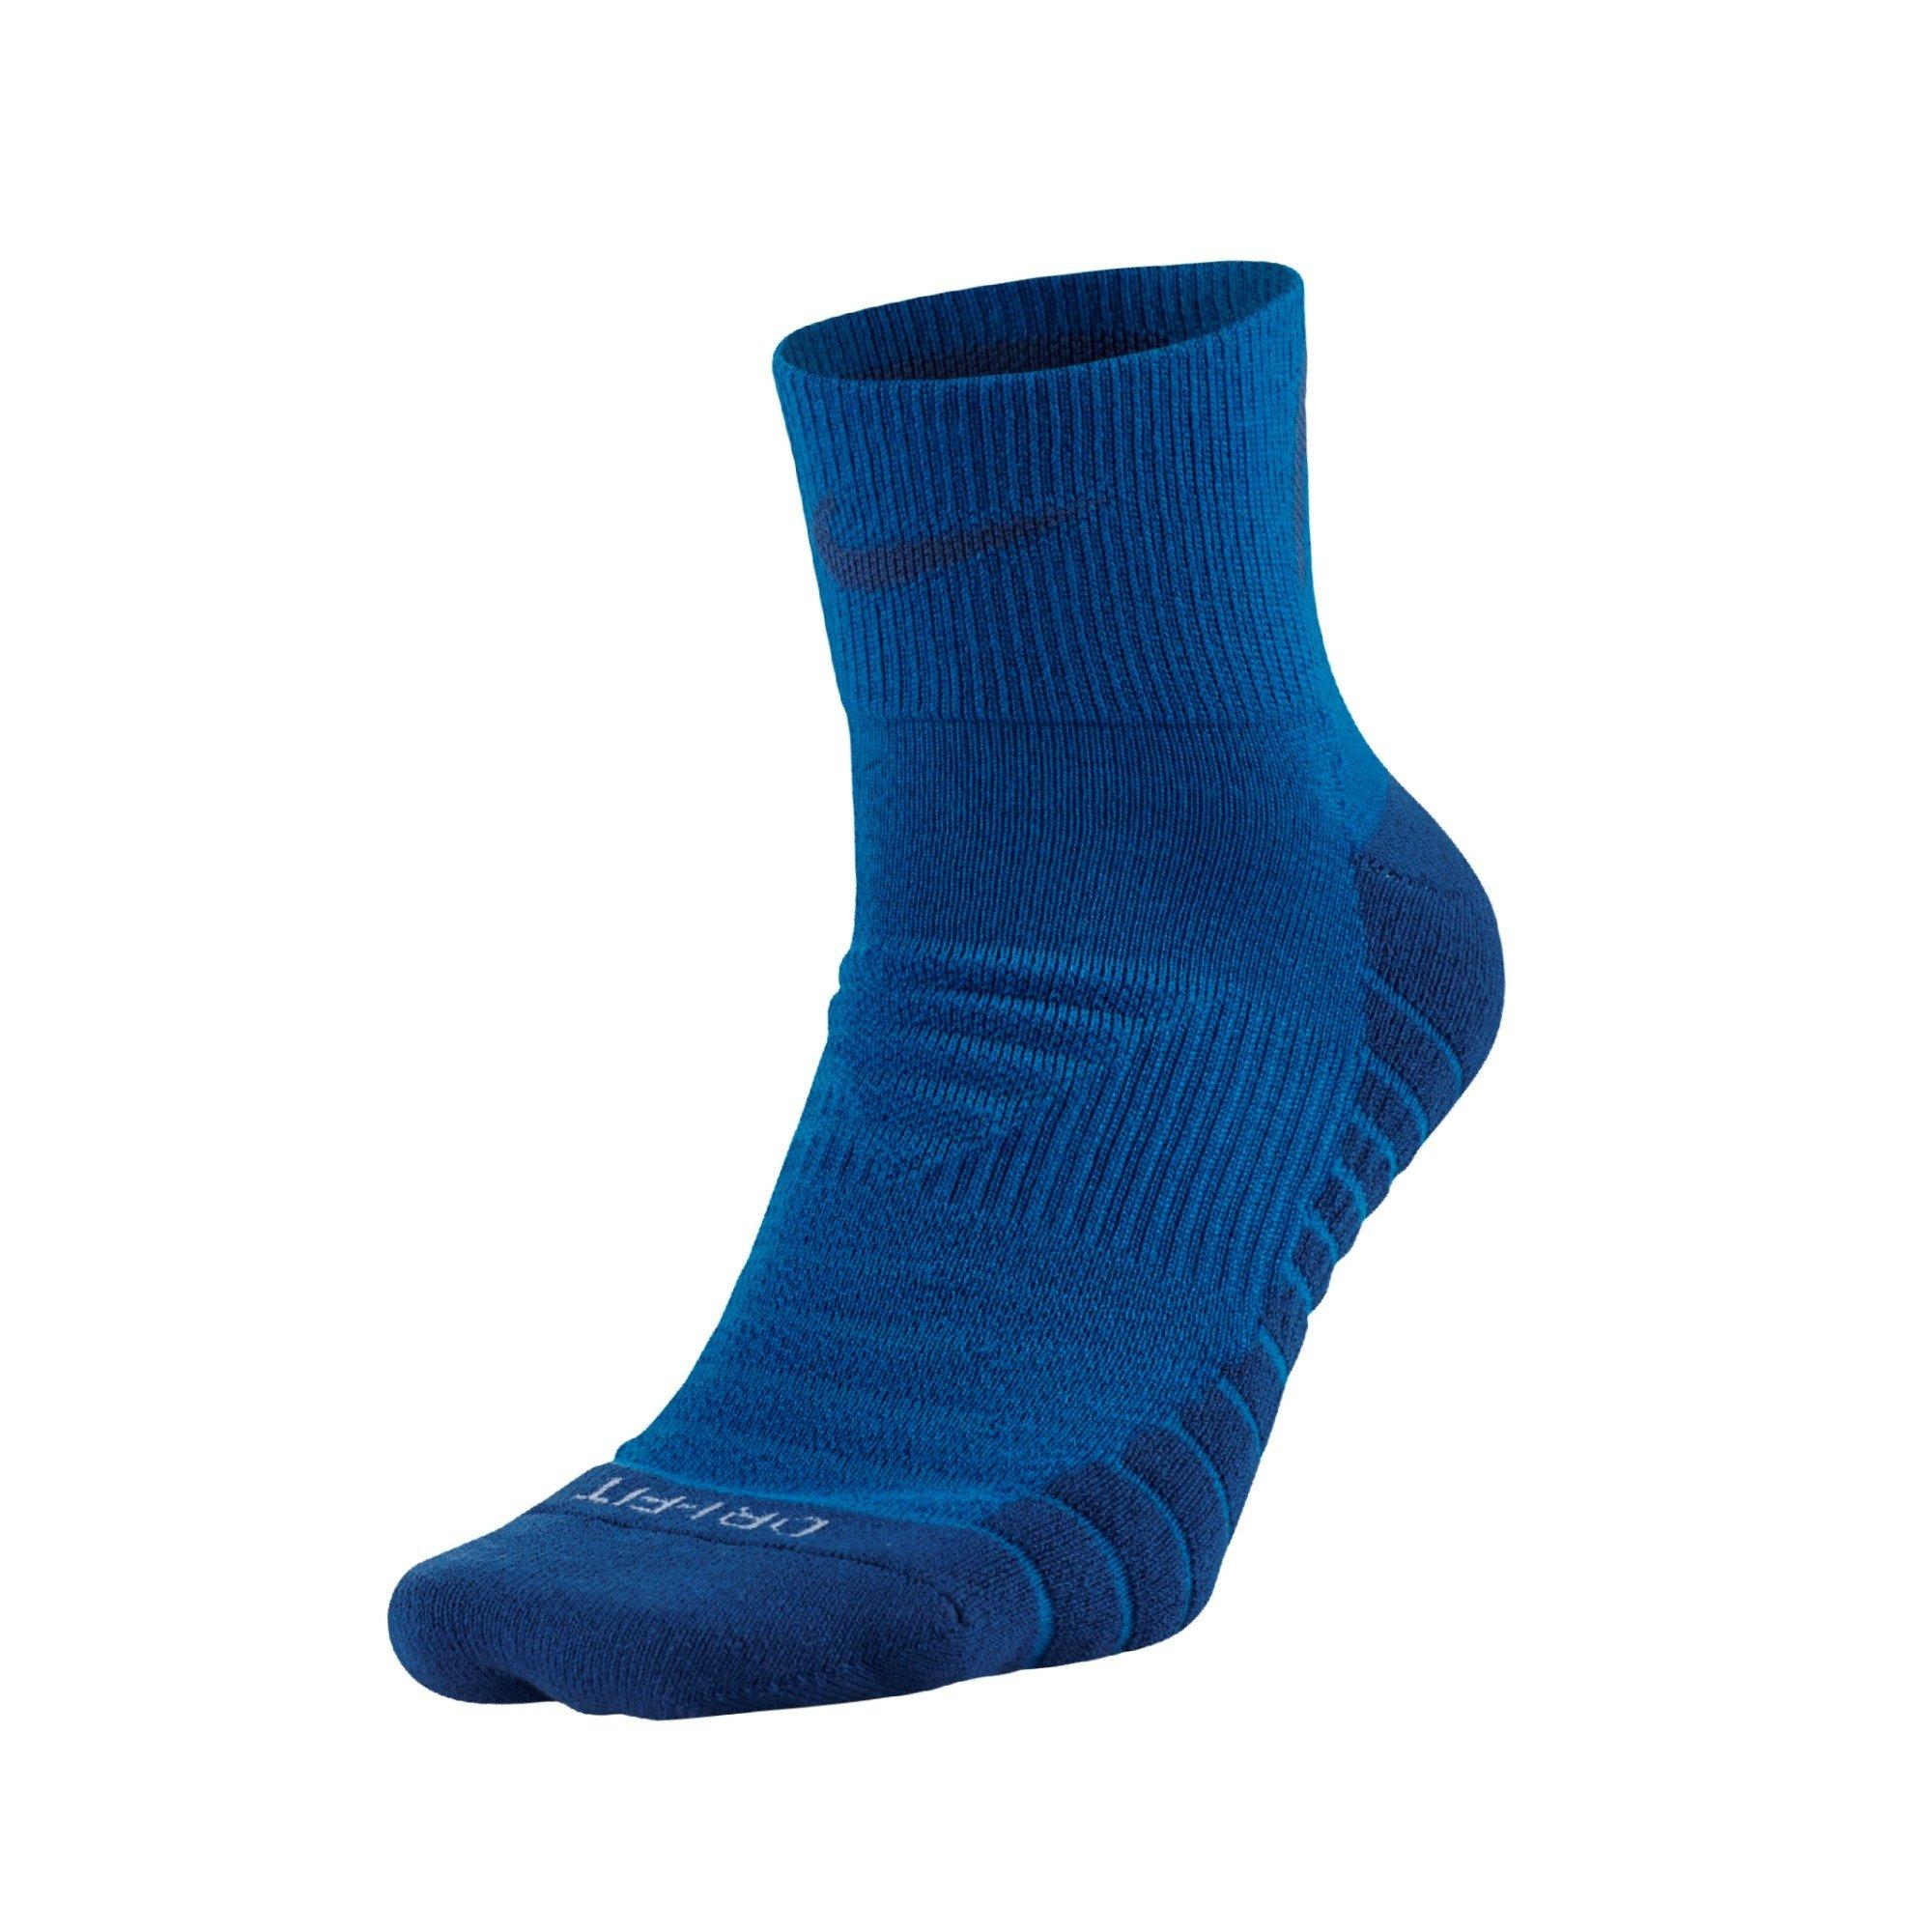 Nike Golf Dry Performance Cushion QTR Socks SG0775-465